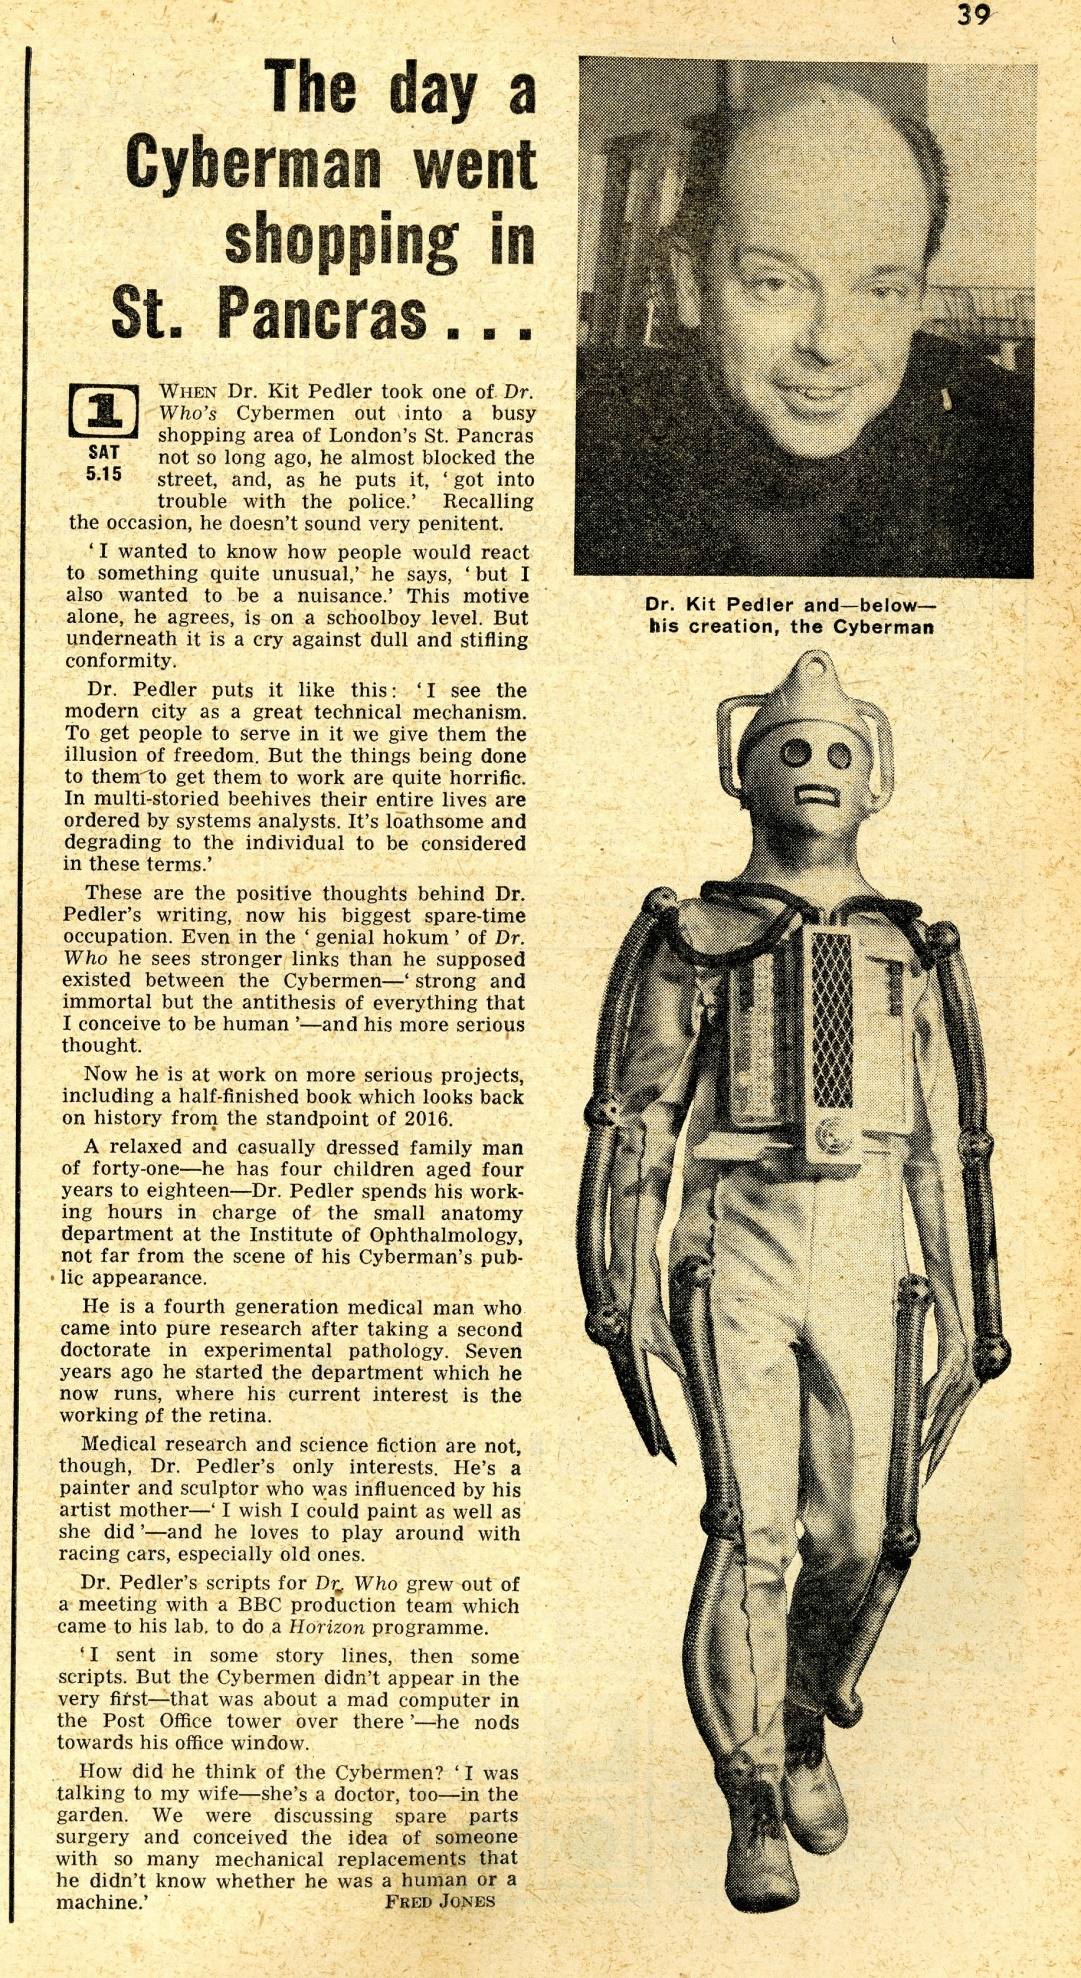 Radio Times, 23-29 November 1968